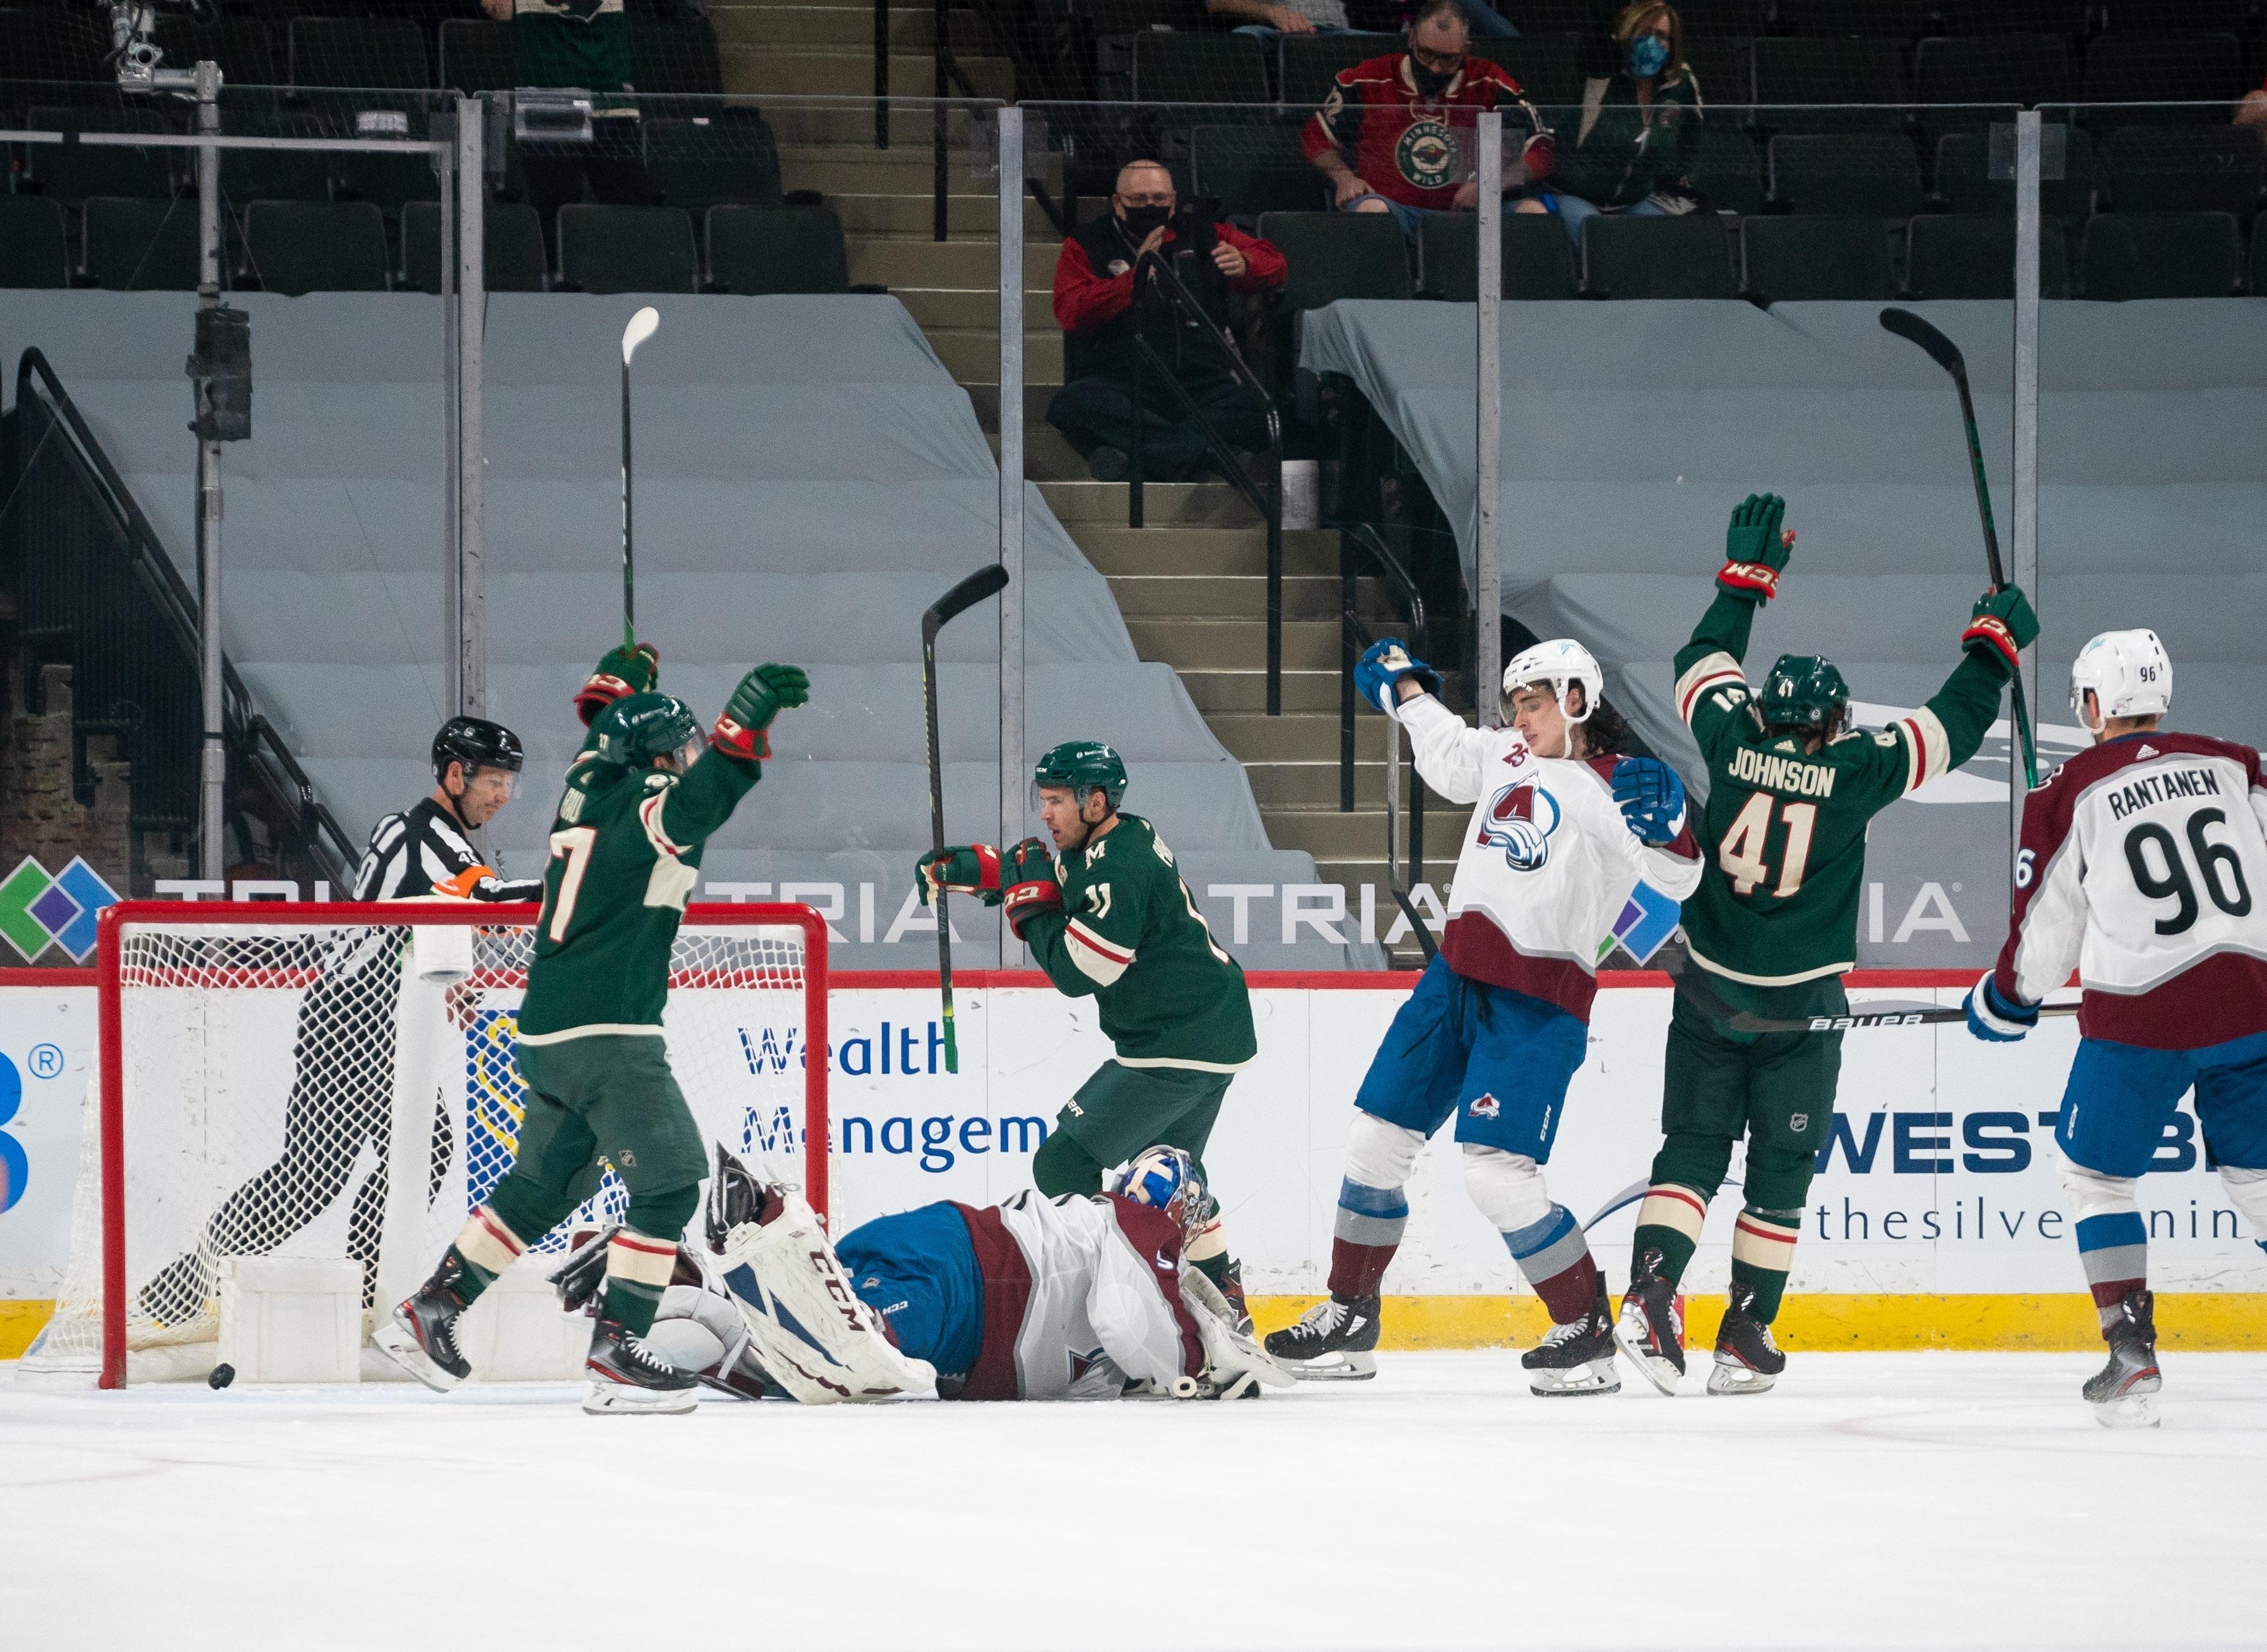 NHL: Colorado Avalanche at Minnesota Wild